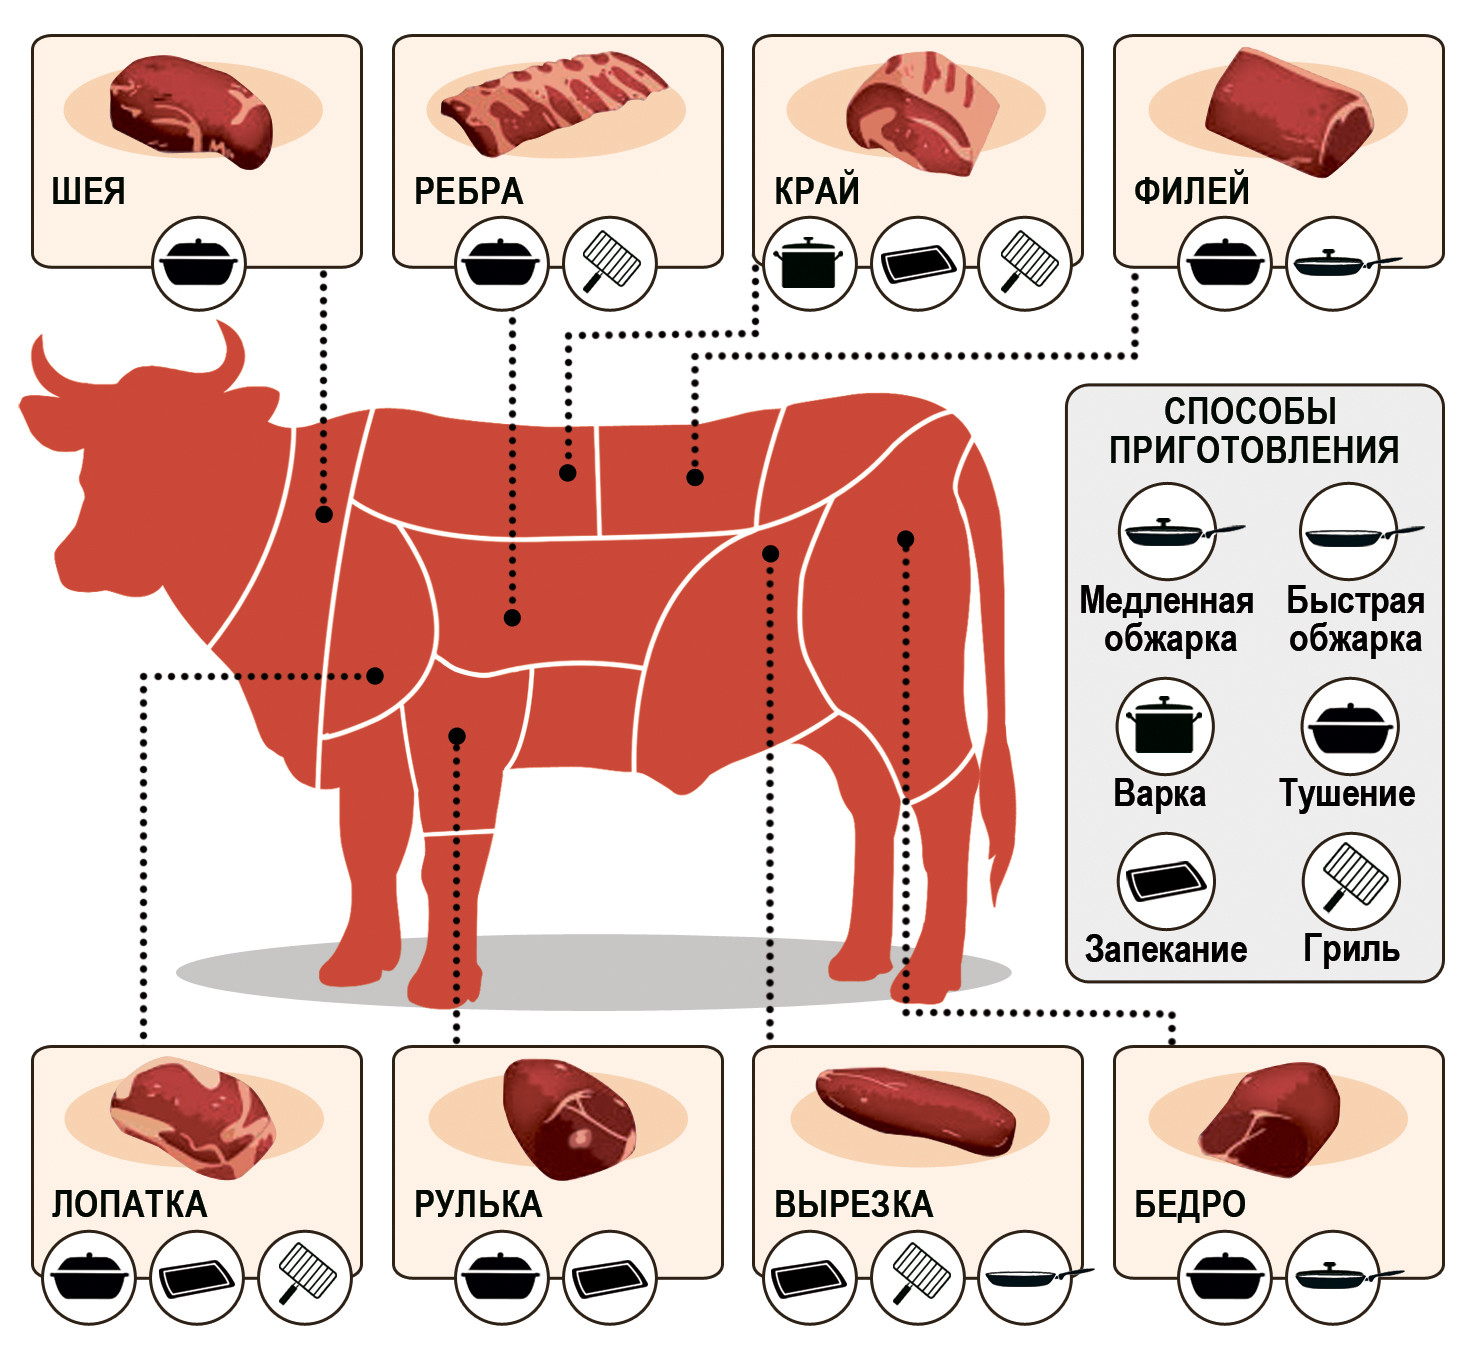 Что на фарш, а что — на гуляш: какая часть говядины самая вкусная и мягкая